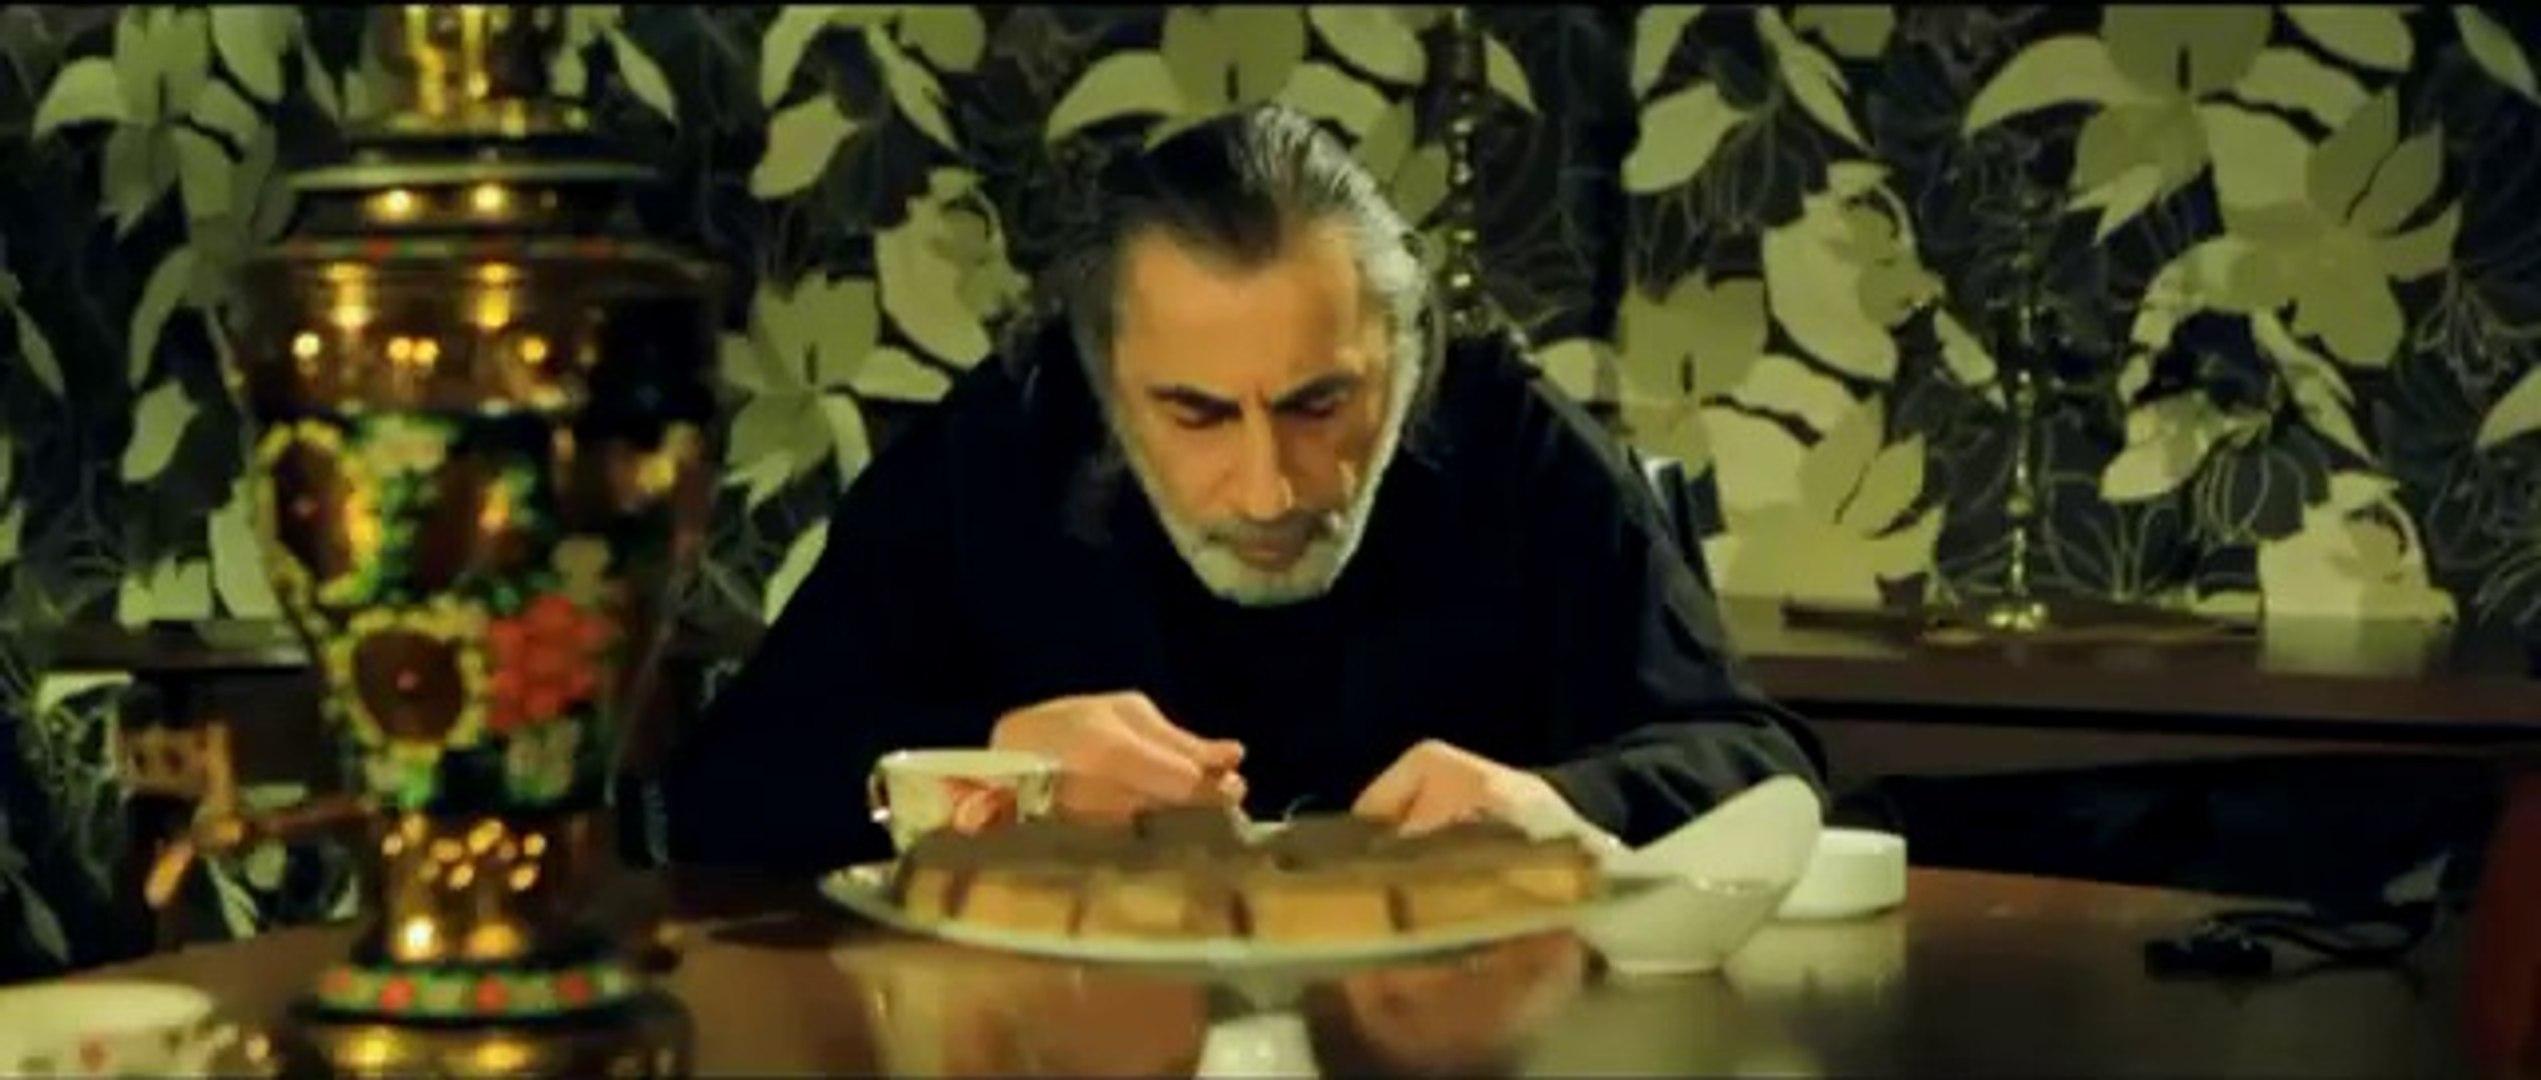 Смотреть онлайн армянский сериал Xaghic durs_5